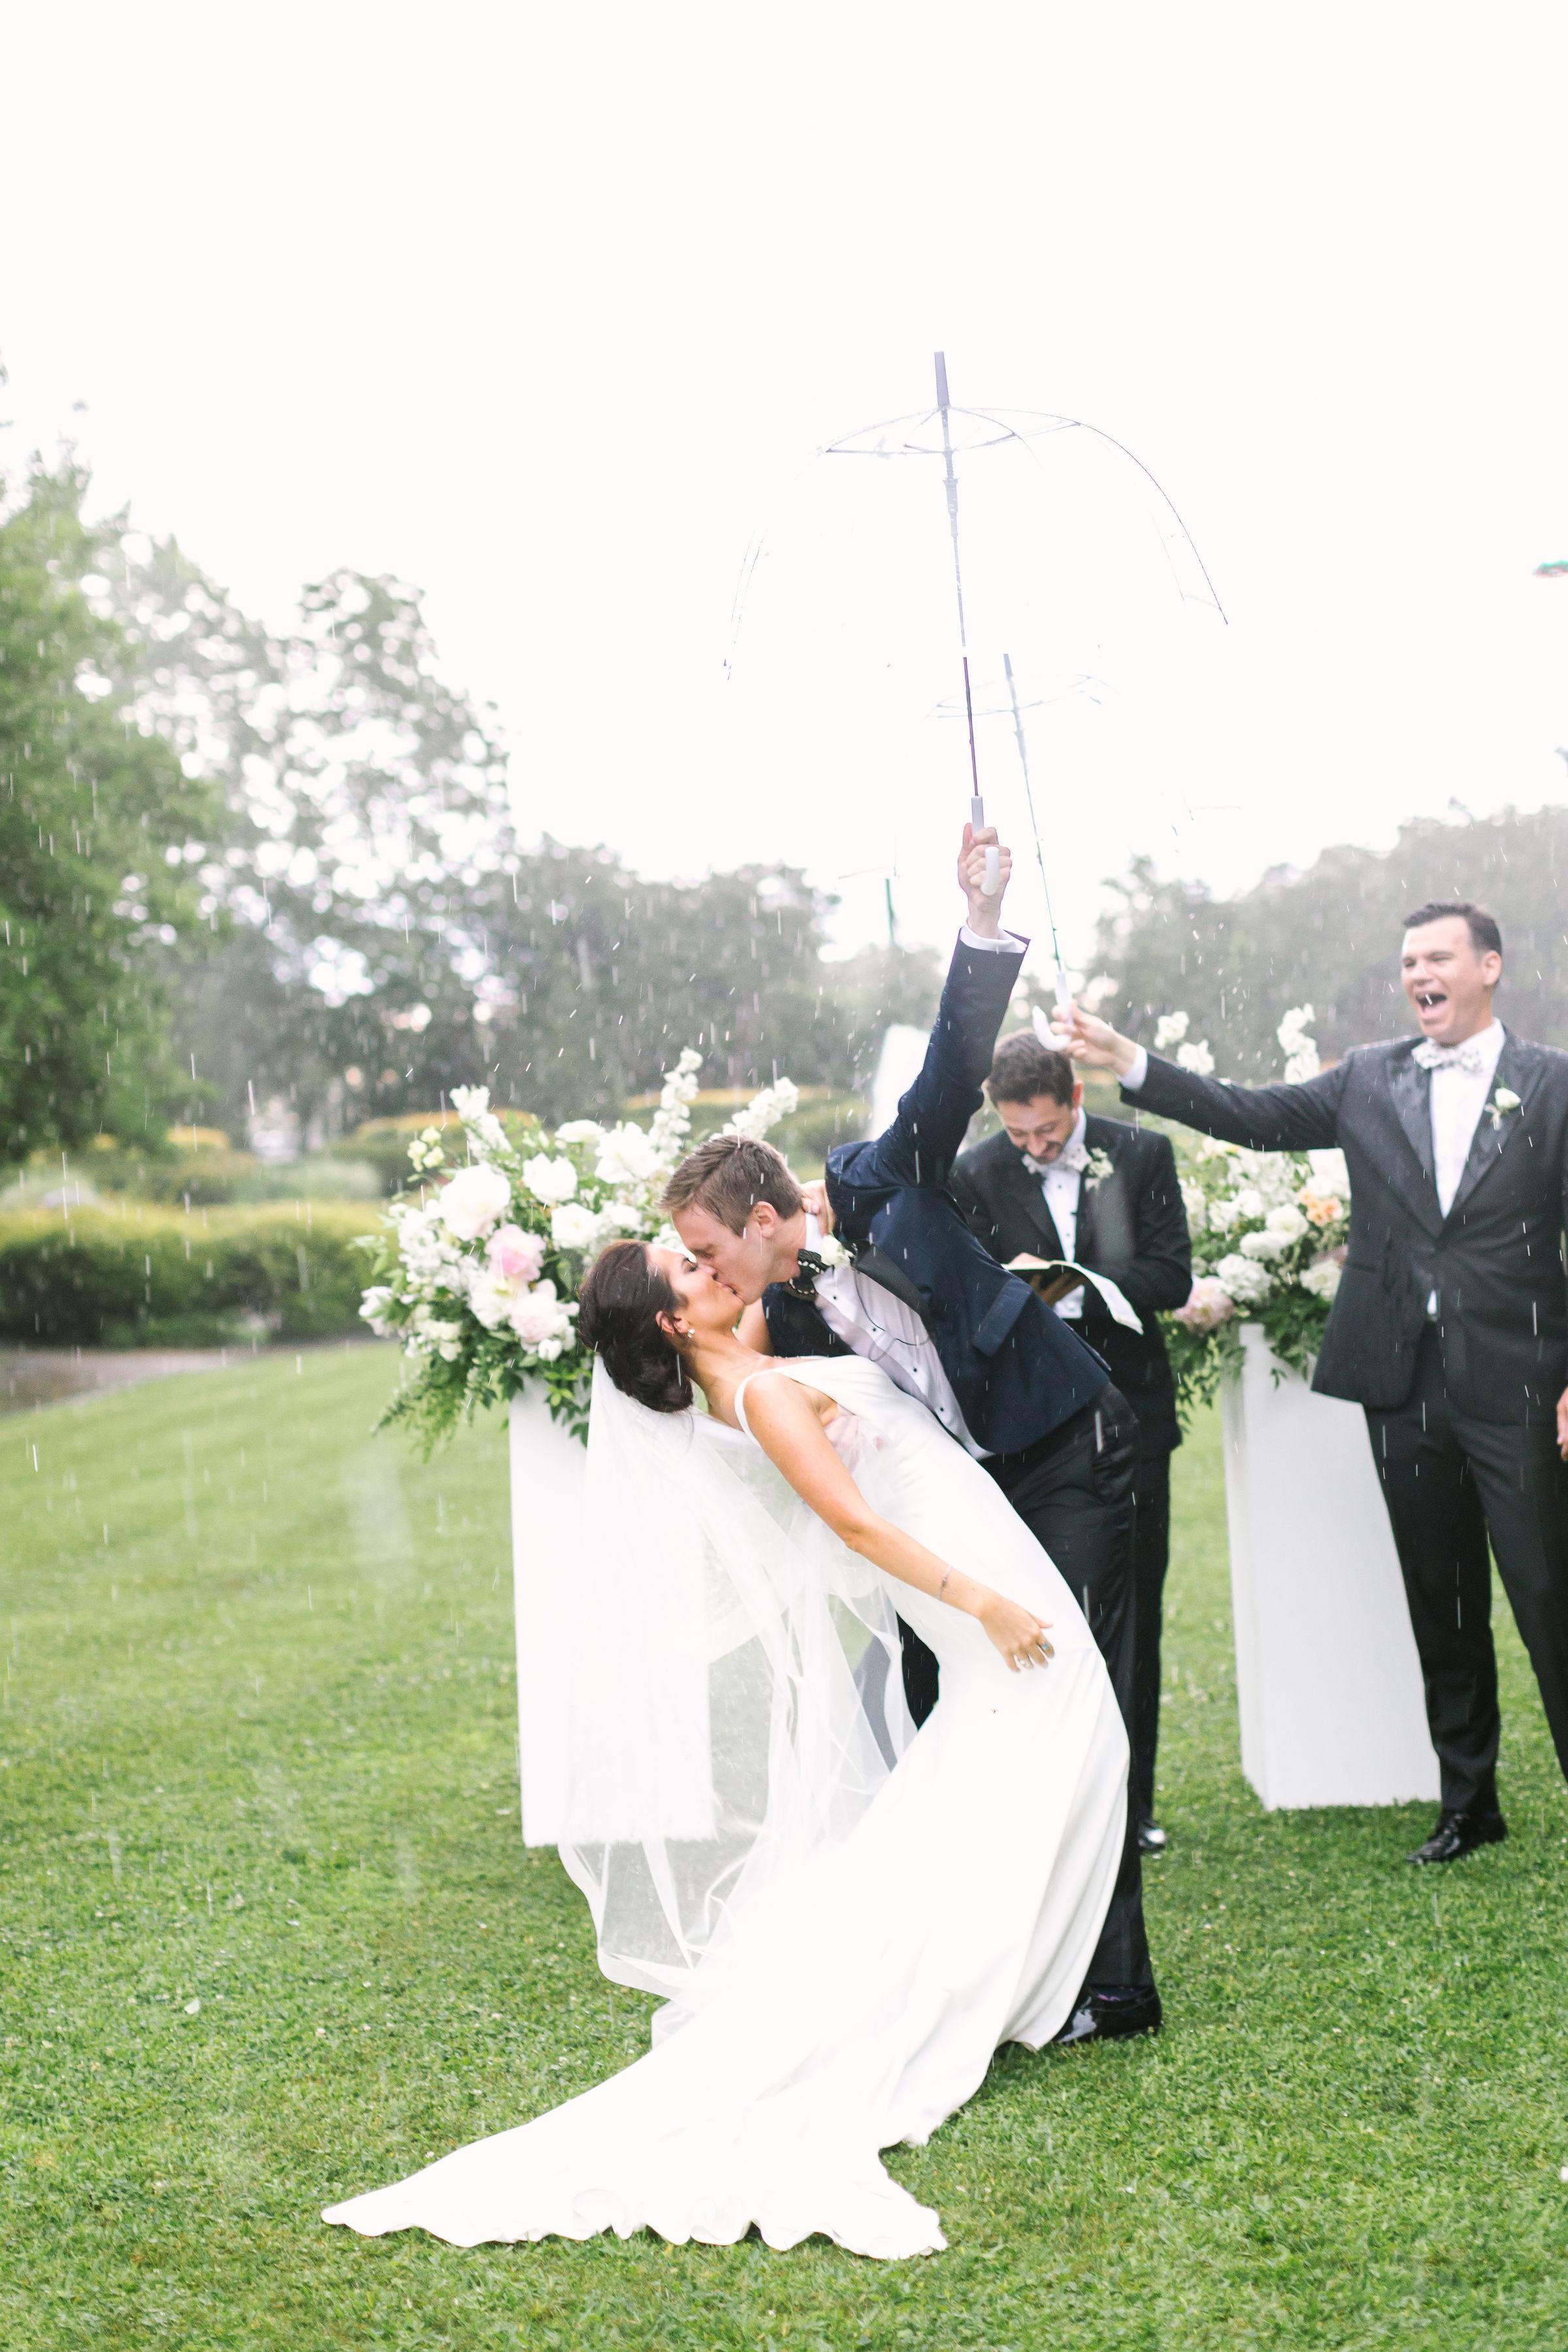 Ellen-Ashton-Photography-Dallas-Wedding-Photographers-Ivory-and-vine-Weddings-979.jpg